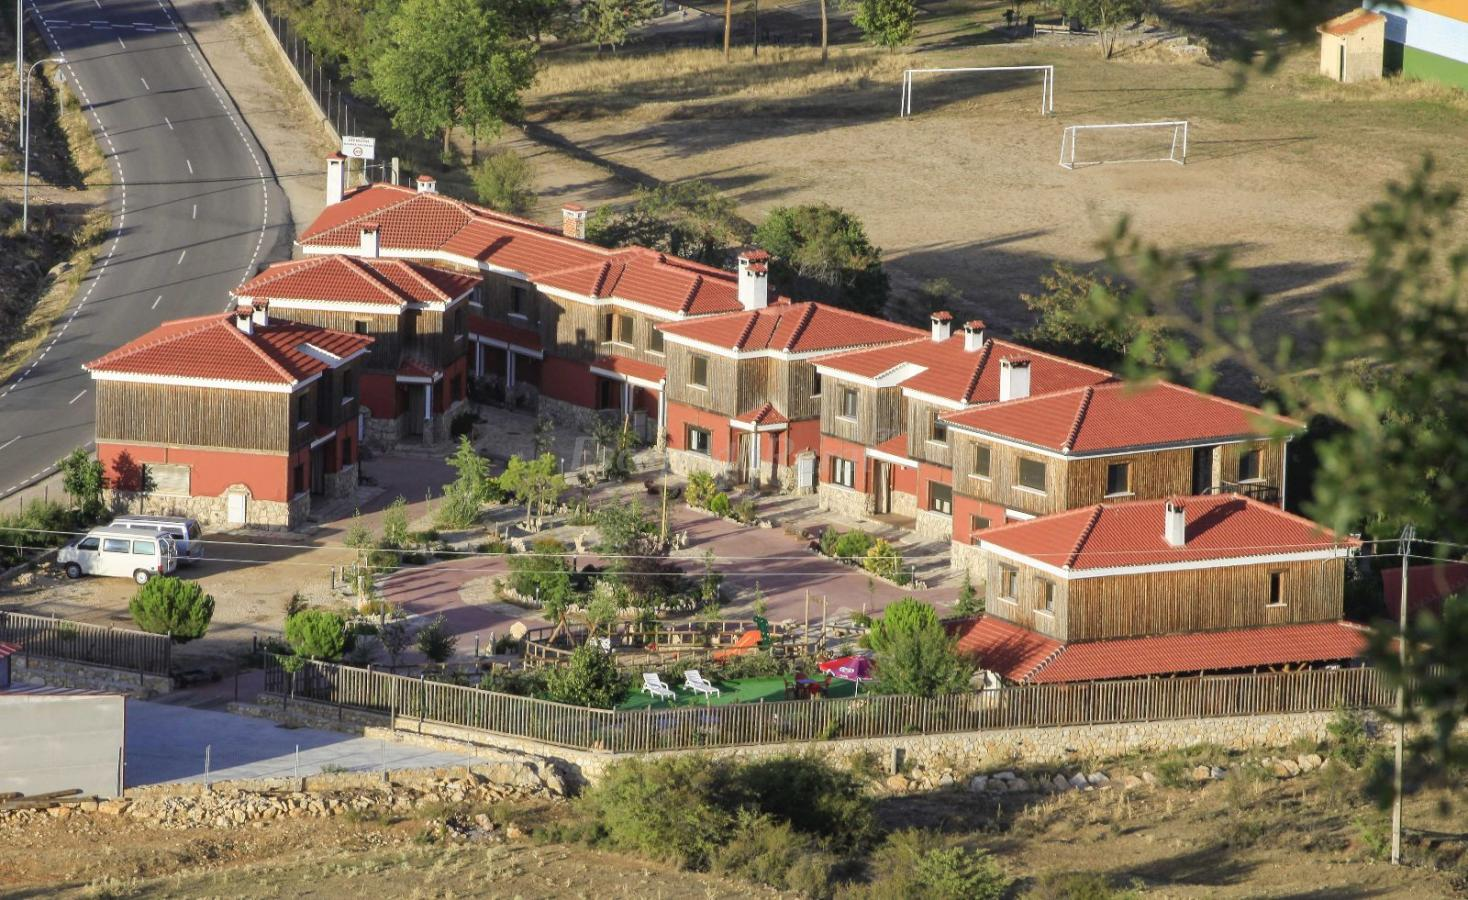 casaruraleelhosquillo - Where to rest-Serranía de Cuenca